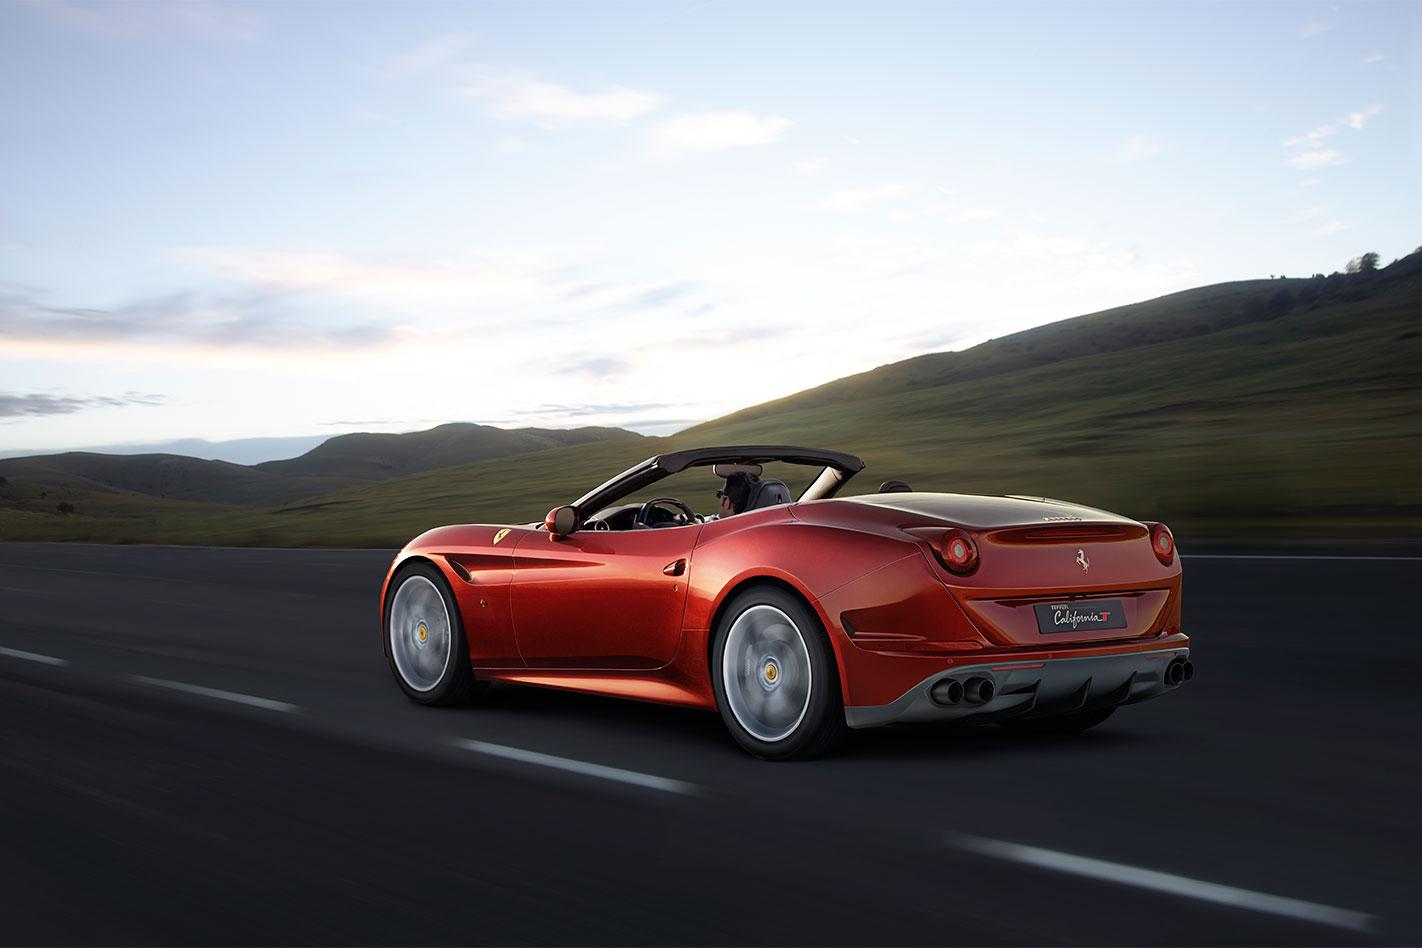 Ferrari -California -T-Handling -Speciale -rear